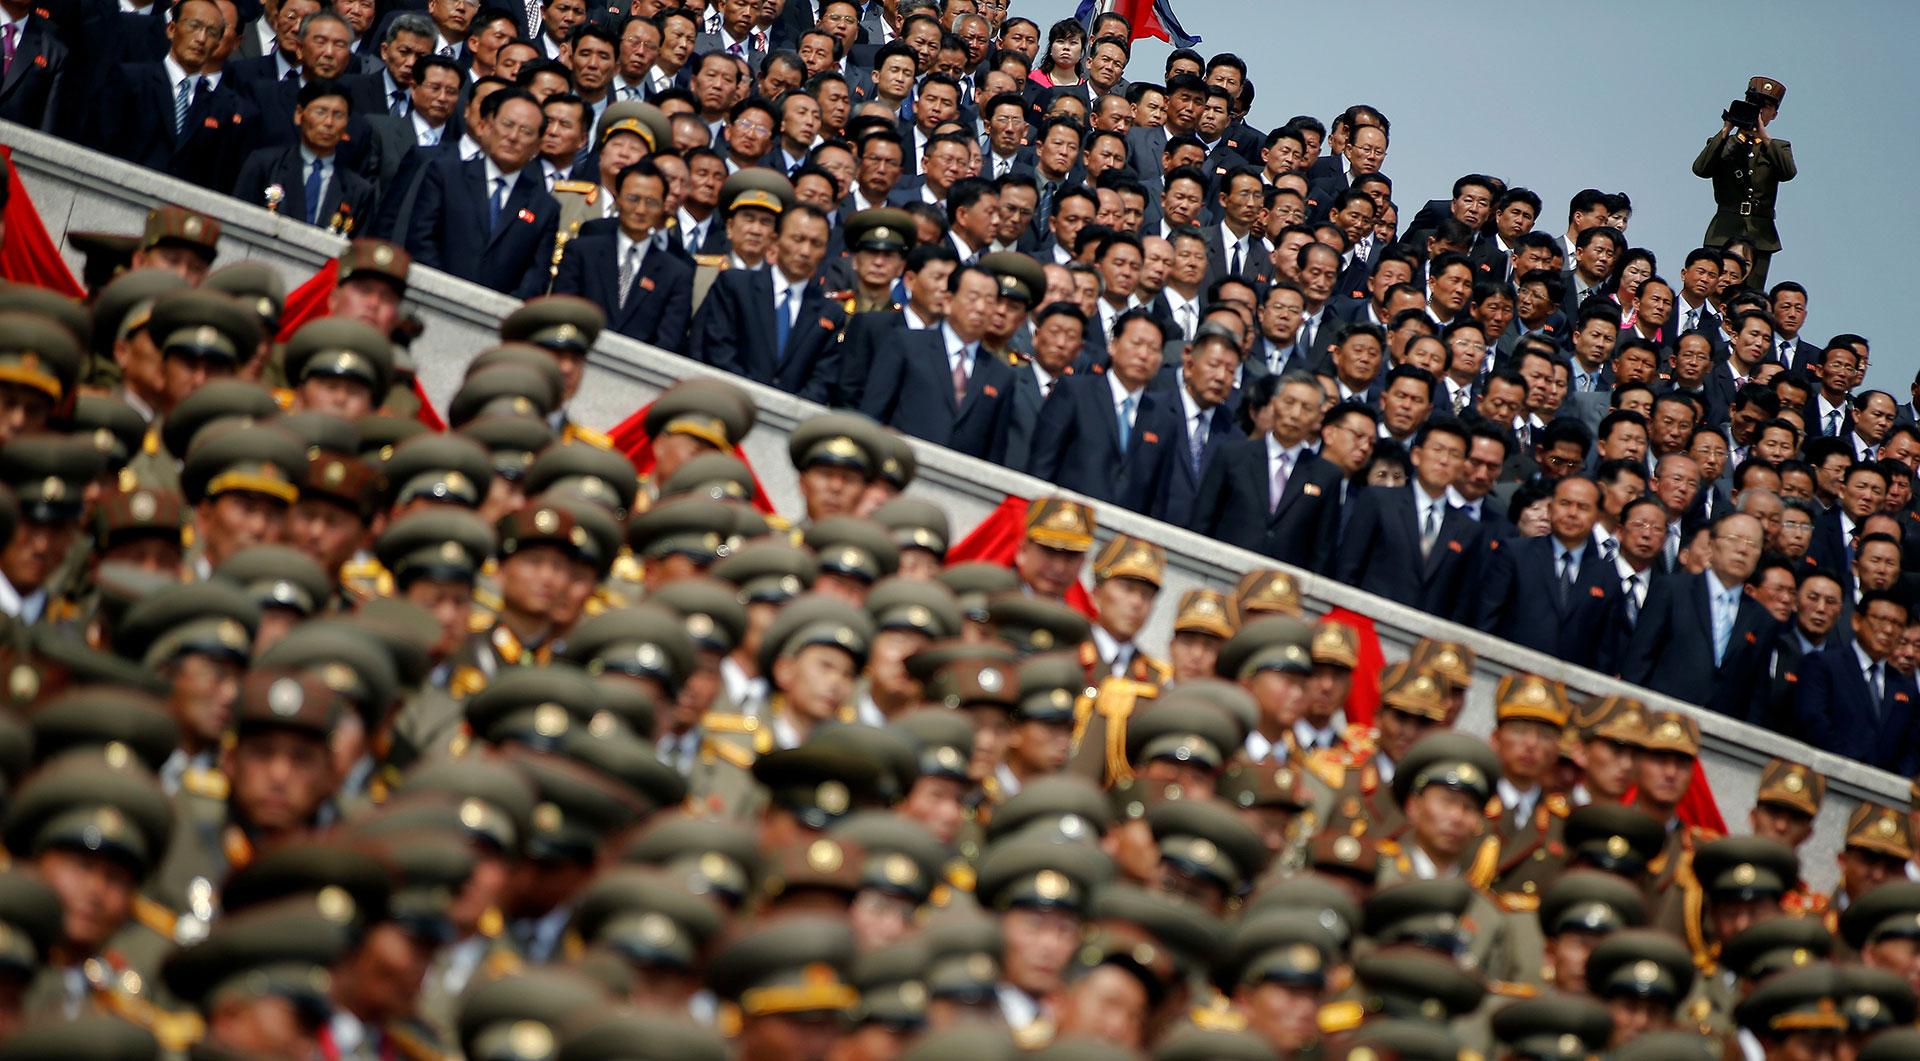 US Continues to Provoke North Korea - Lavrov